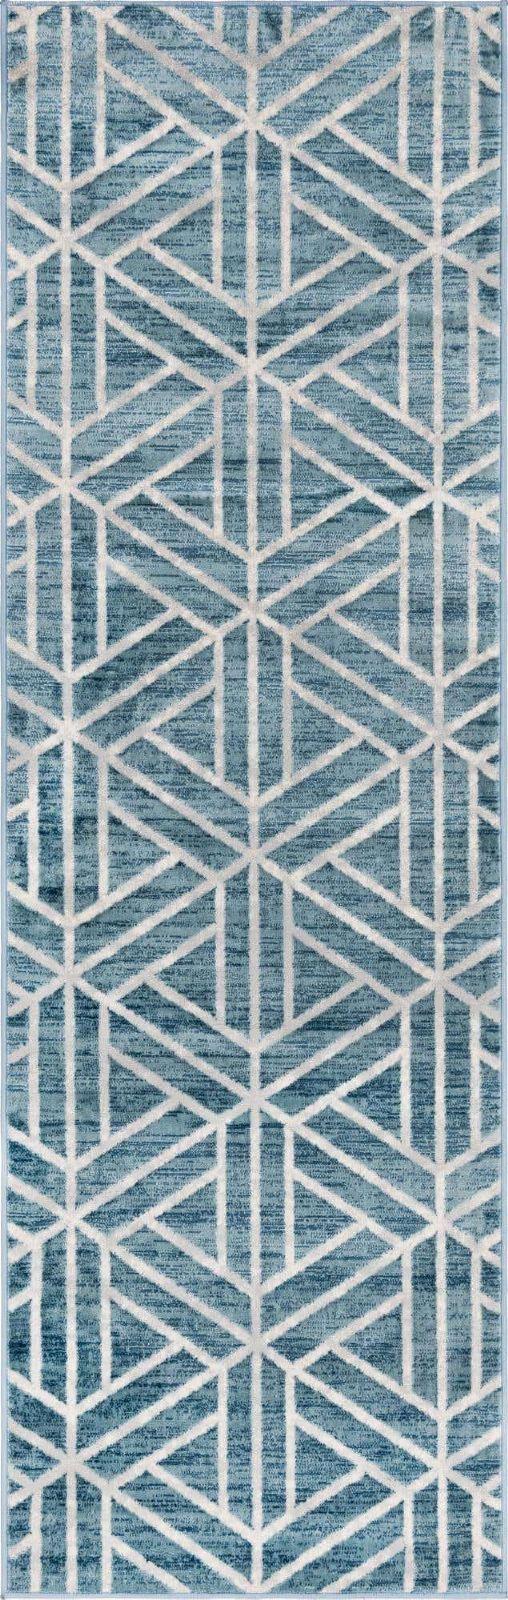 rugpal kashi contemporary area rug collection